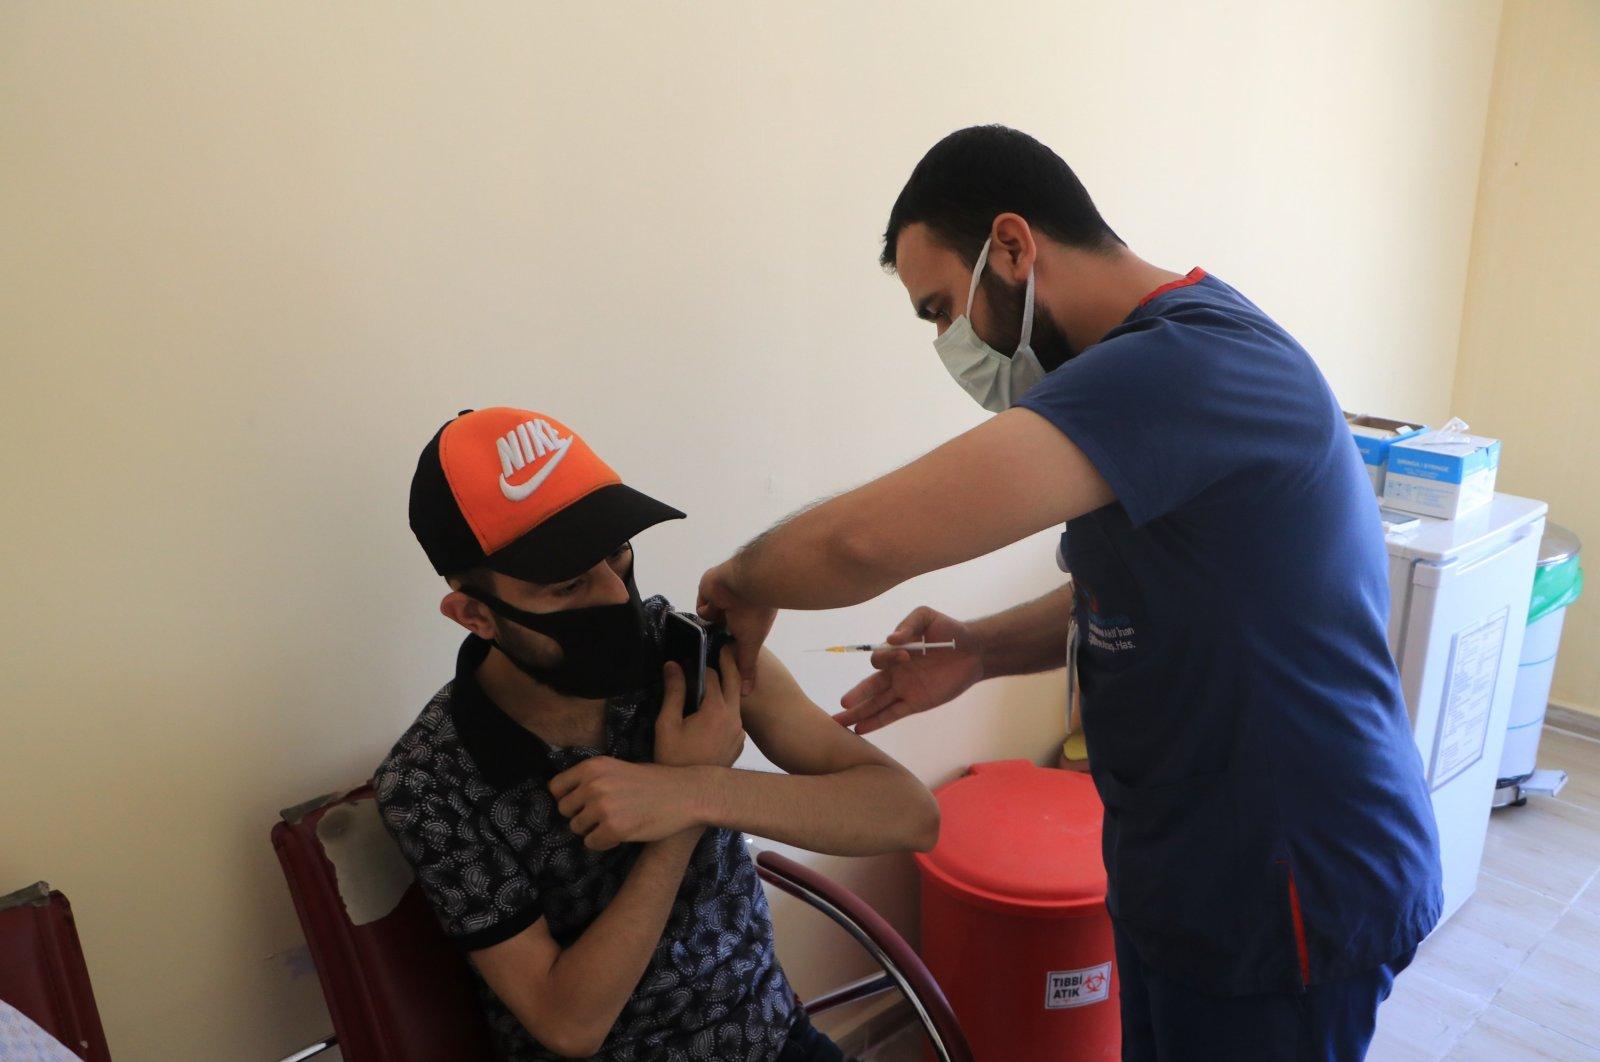 A man gets vaccinated at a hospital, in Şanlıurfa, southeastern Turkey, Aug. 25, 2021. (DHA PHOTO)